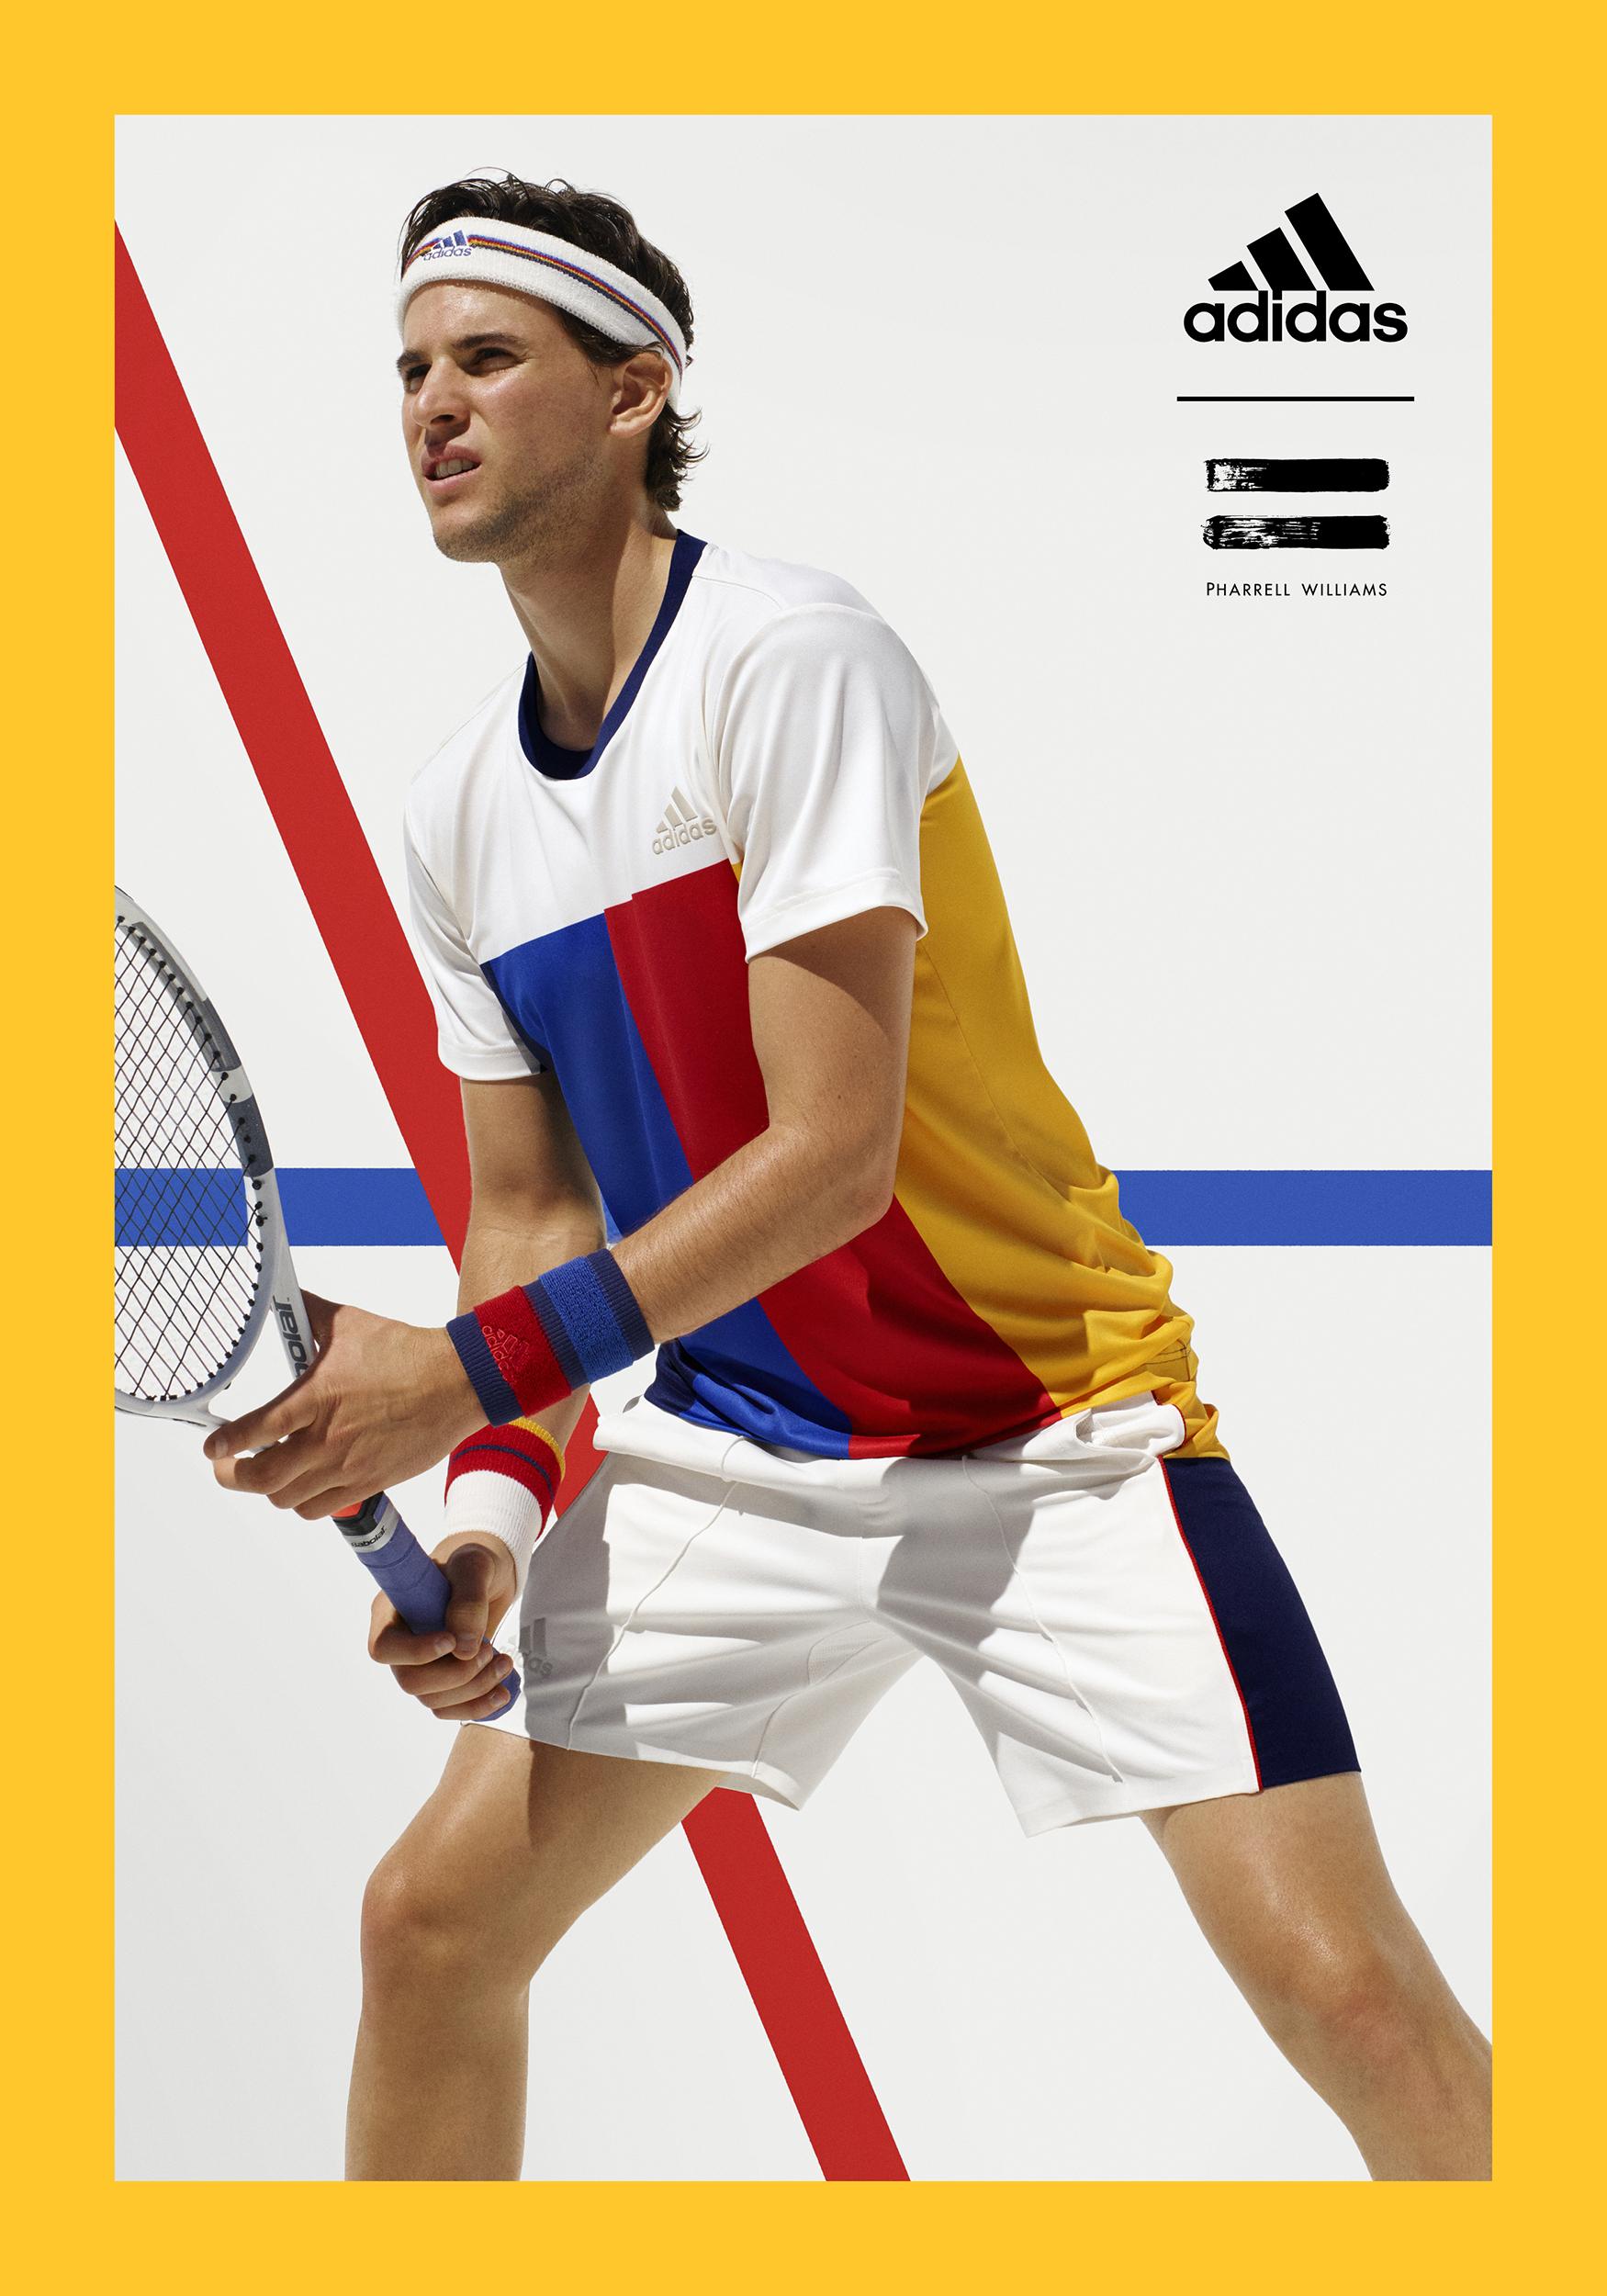 8c7c5f26cdb60 adidas tennis pharrell williams collection us open 4 - WearTesters